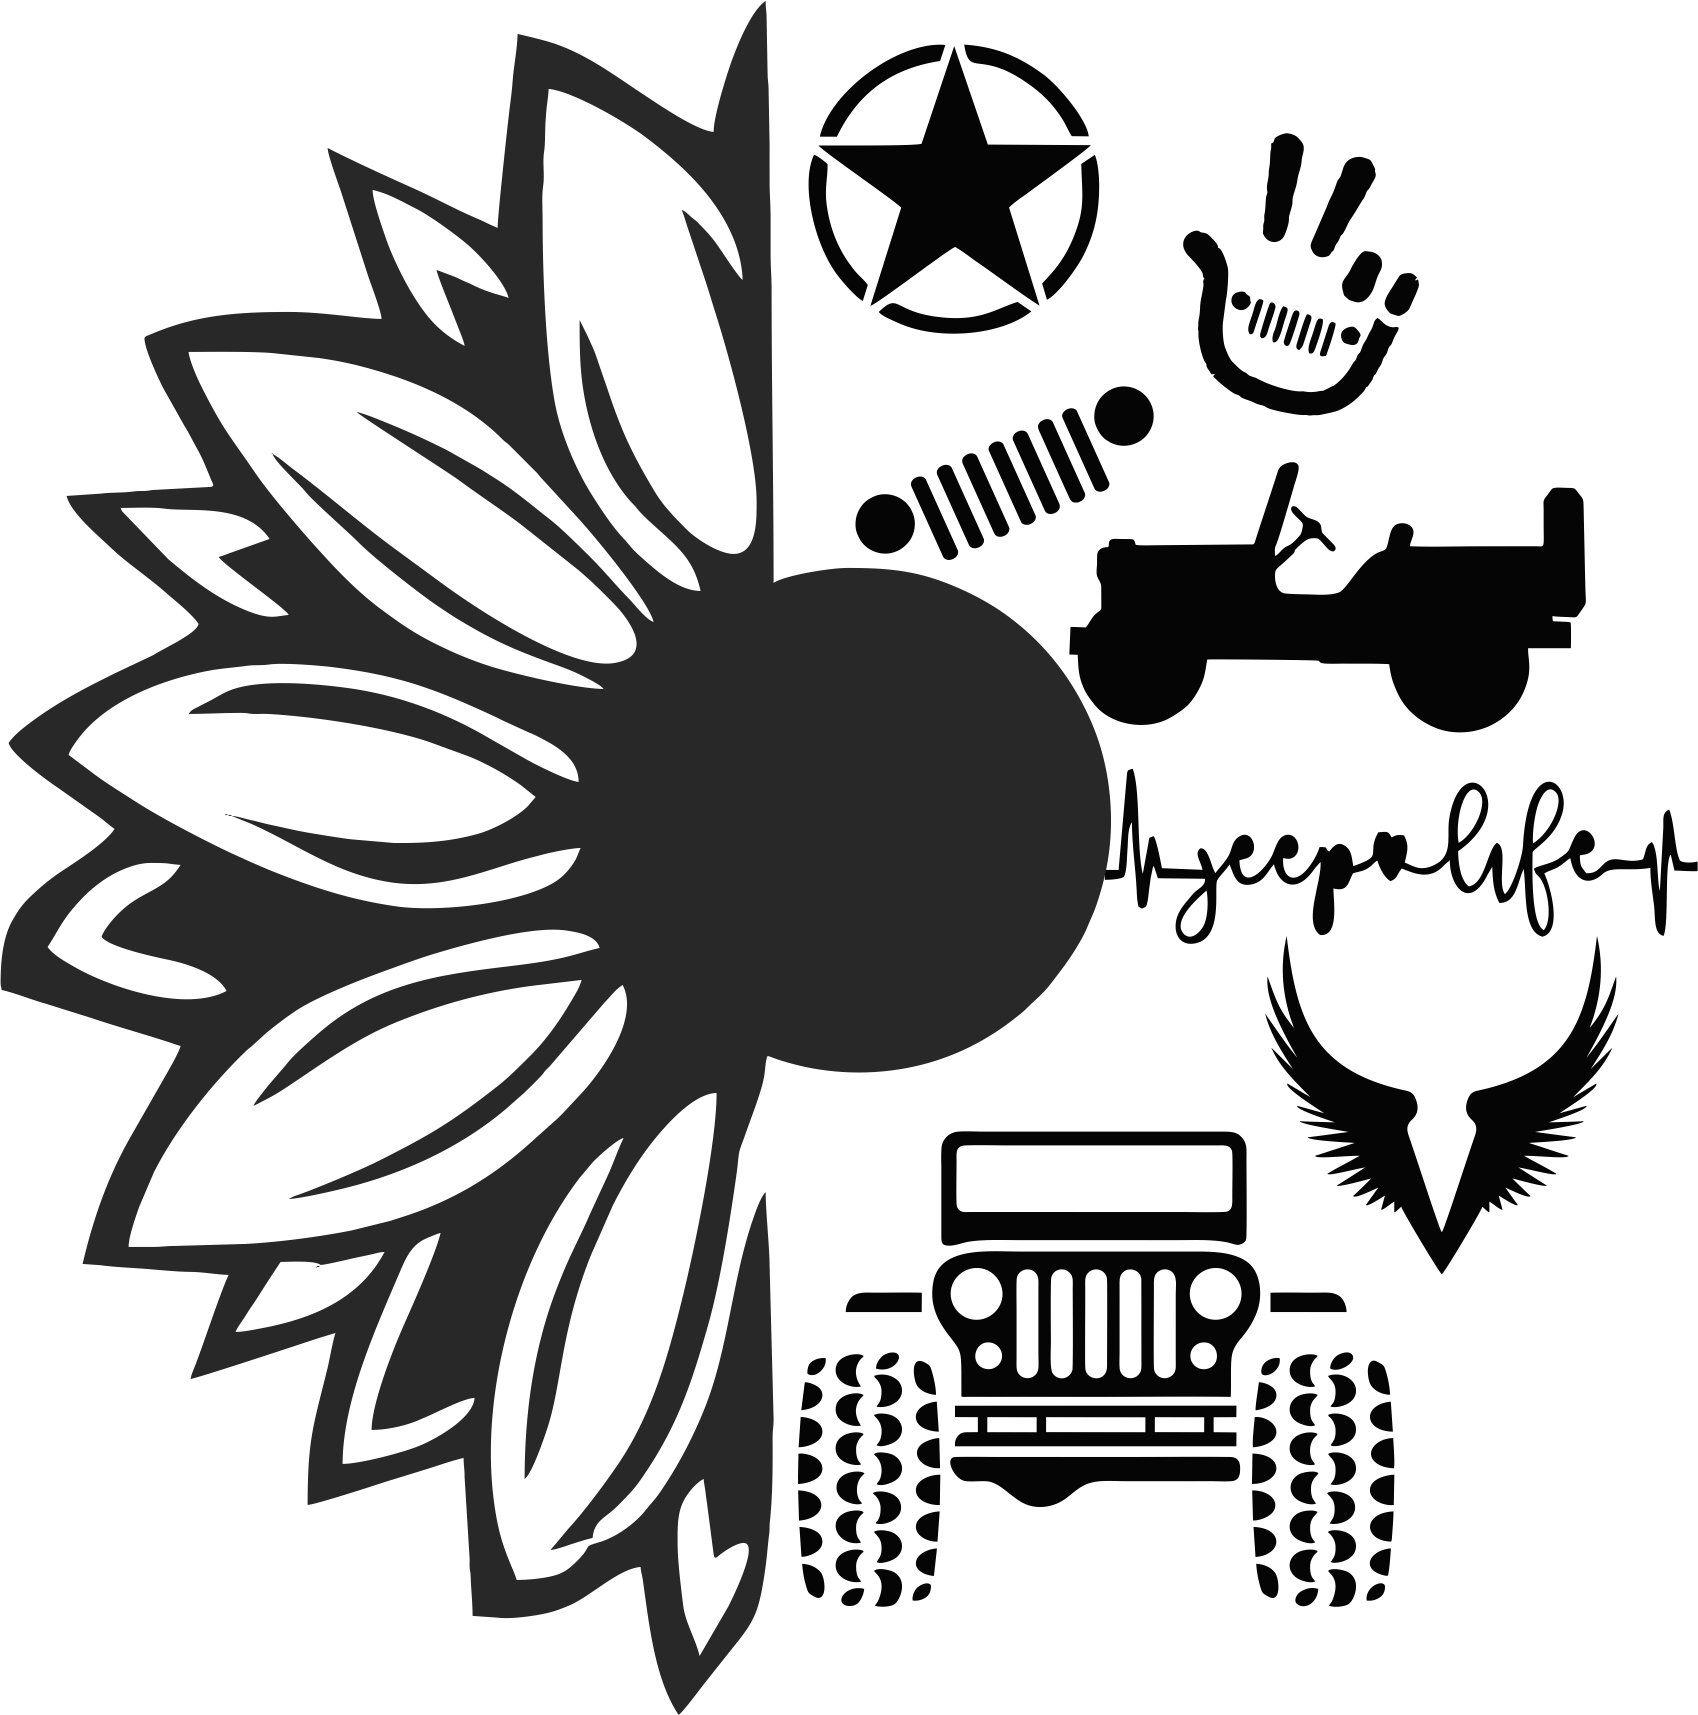 Download Sunflower Jeep SVG in 2020 | Cricut projects vinyl, Cricut ...